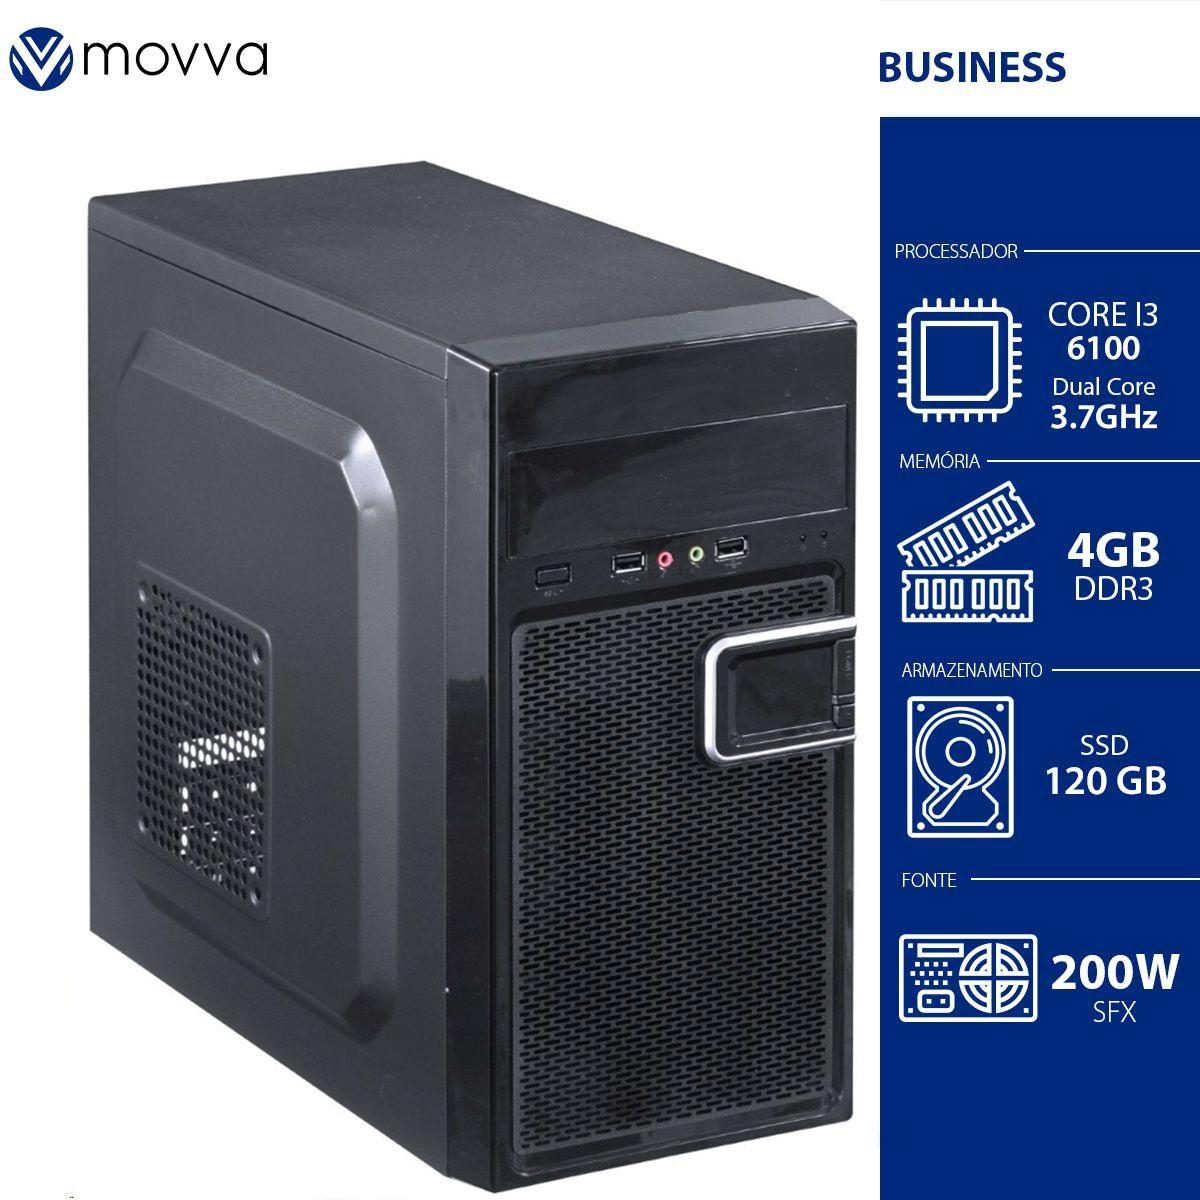 Computador Movva Hydro Intel i3 6100, 4GB, SSD 120GB, Fonte 200w Linux